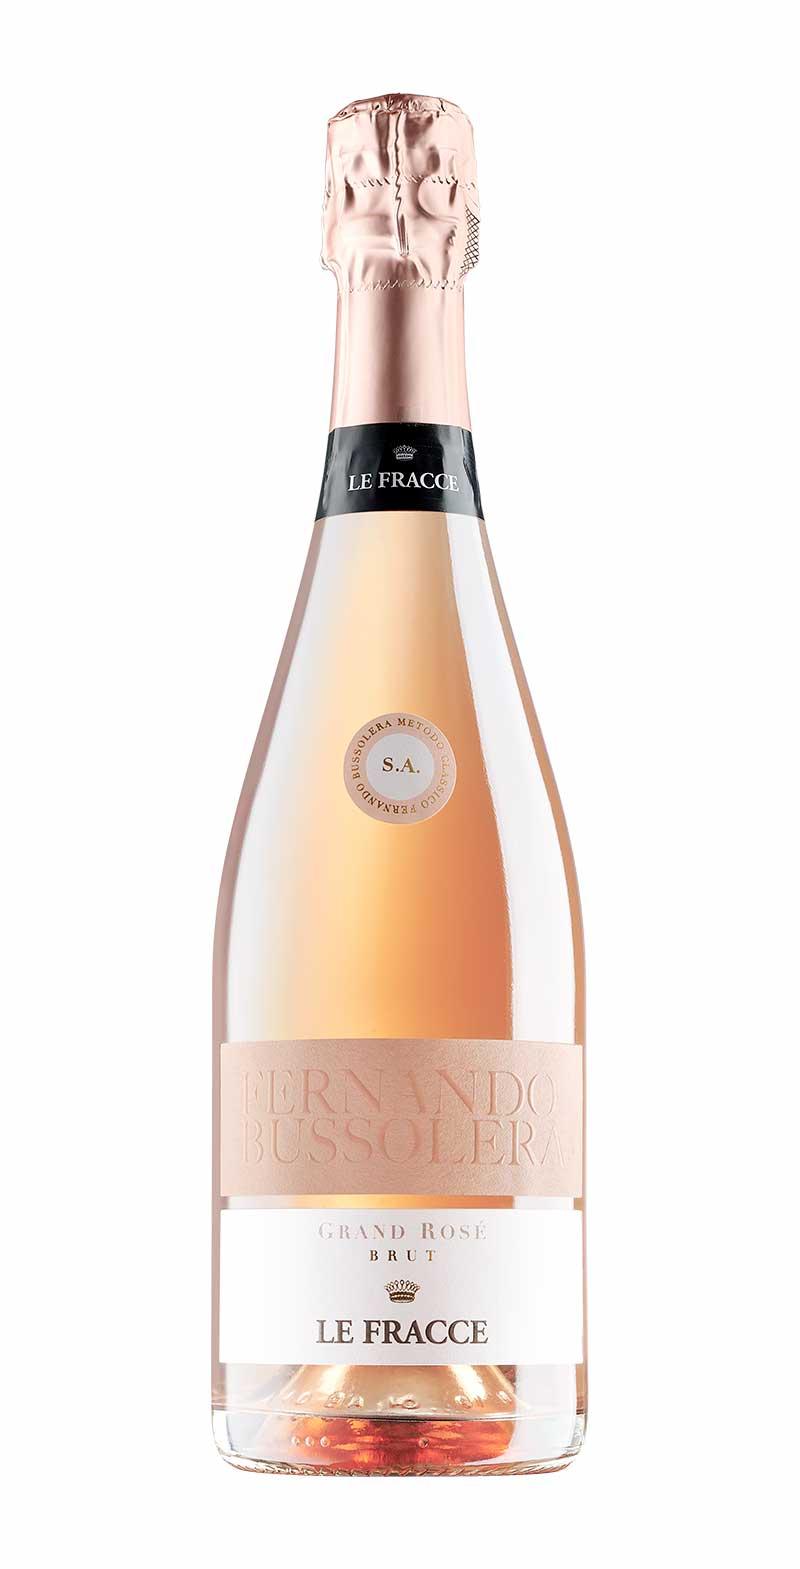 Bussolera Grand Rosé - Brut Pinot Nero